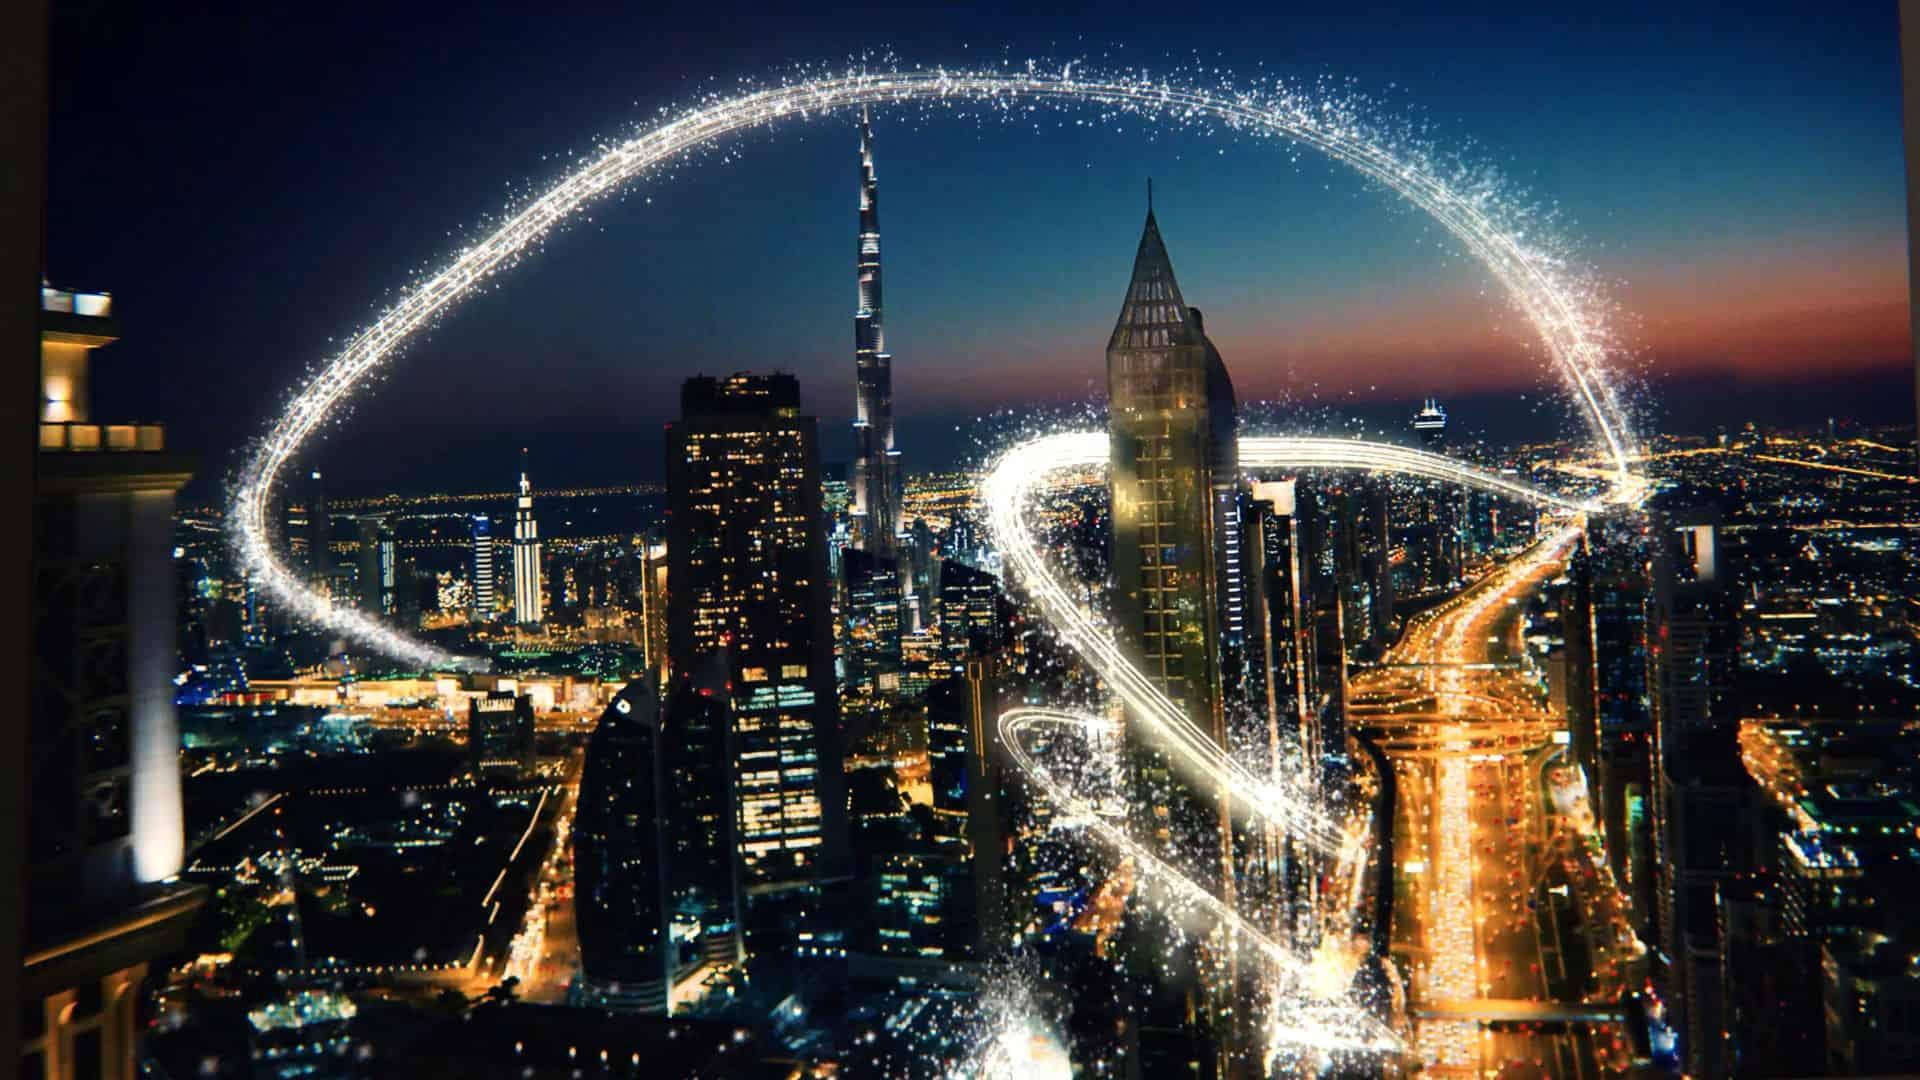 World Expo Dubai _1YTG_v25_1810-0001